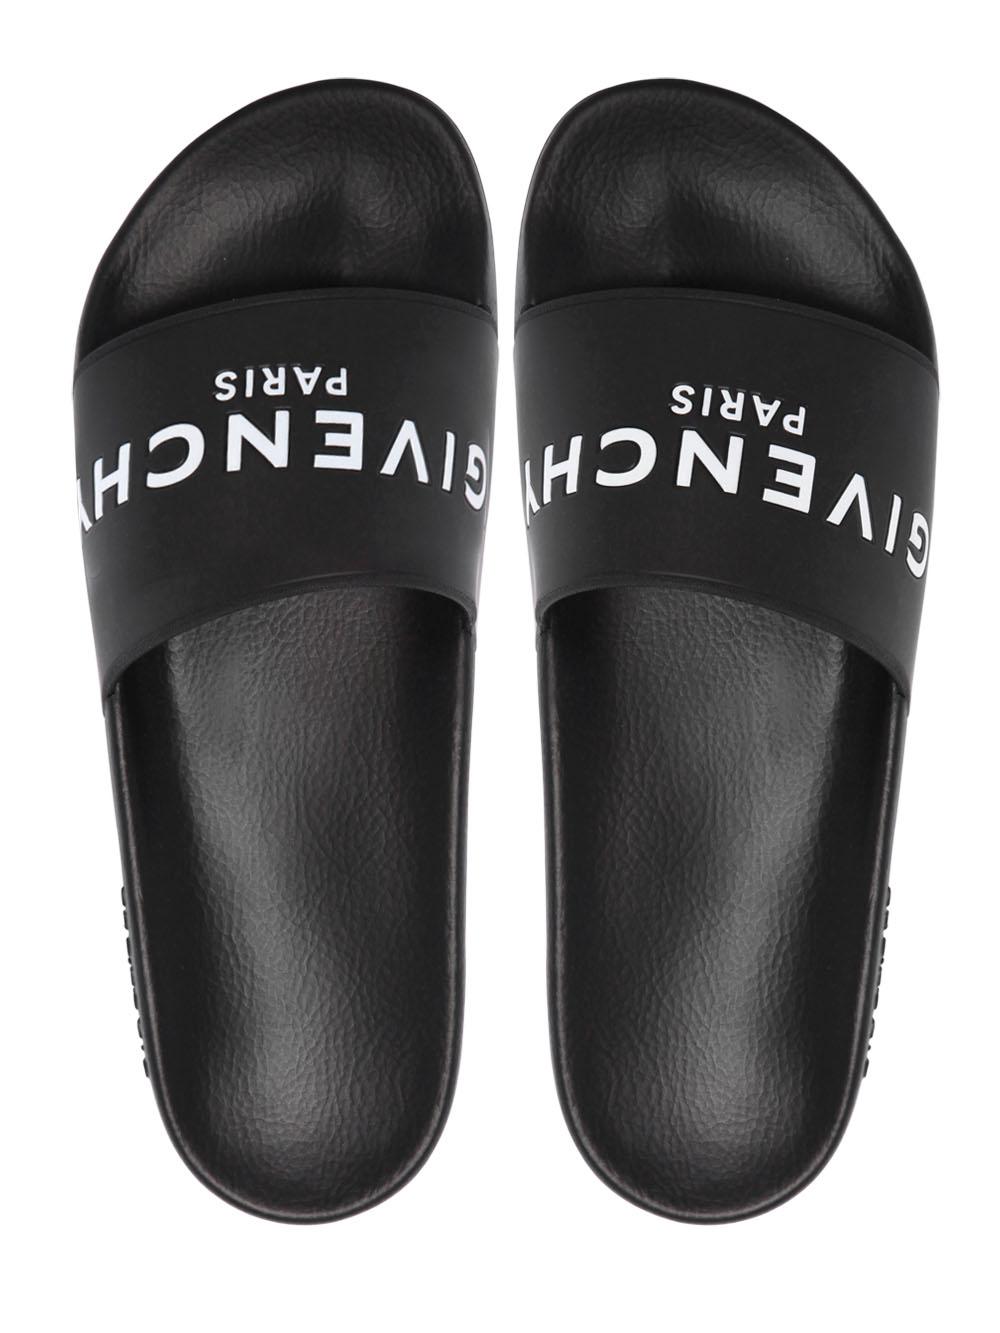 Givenchy Rubber slide sandals s8UWxBgn